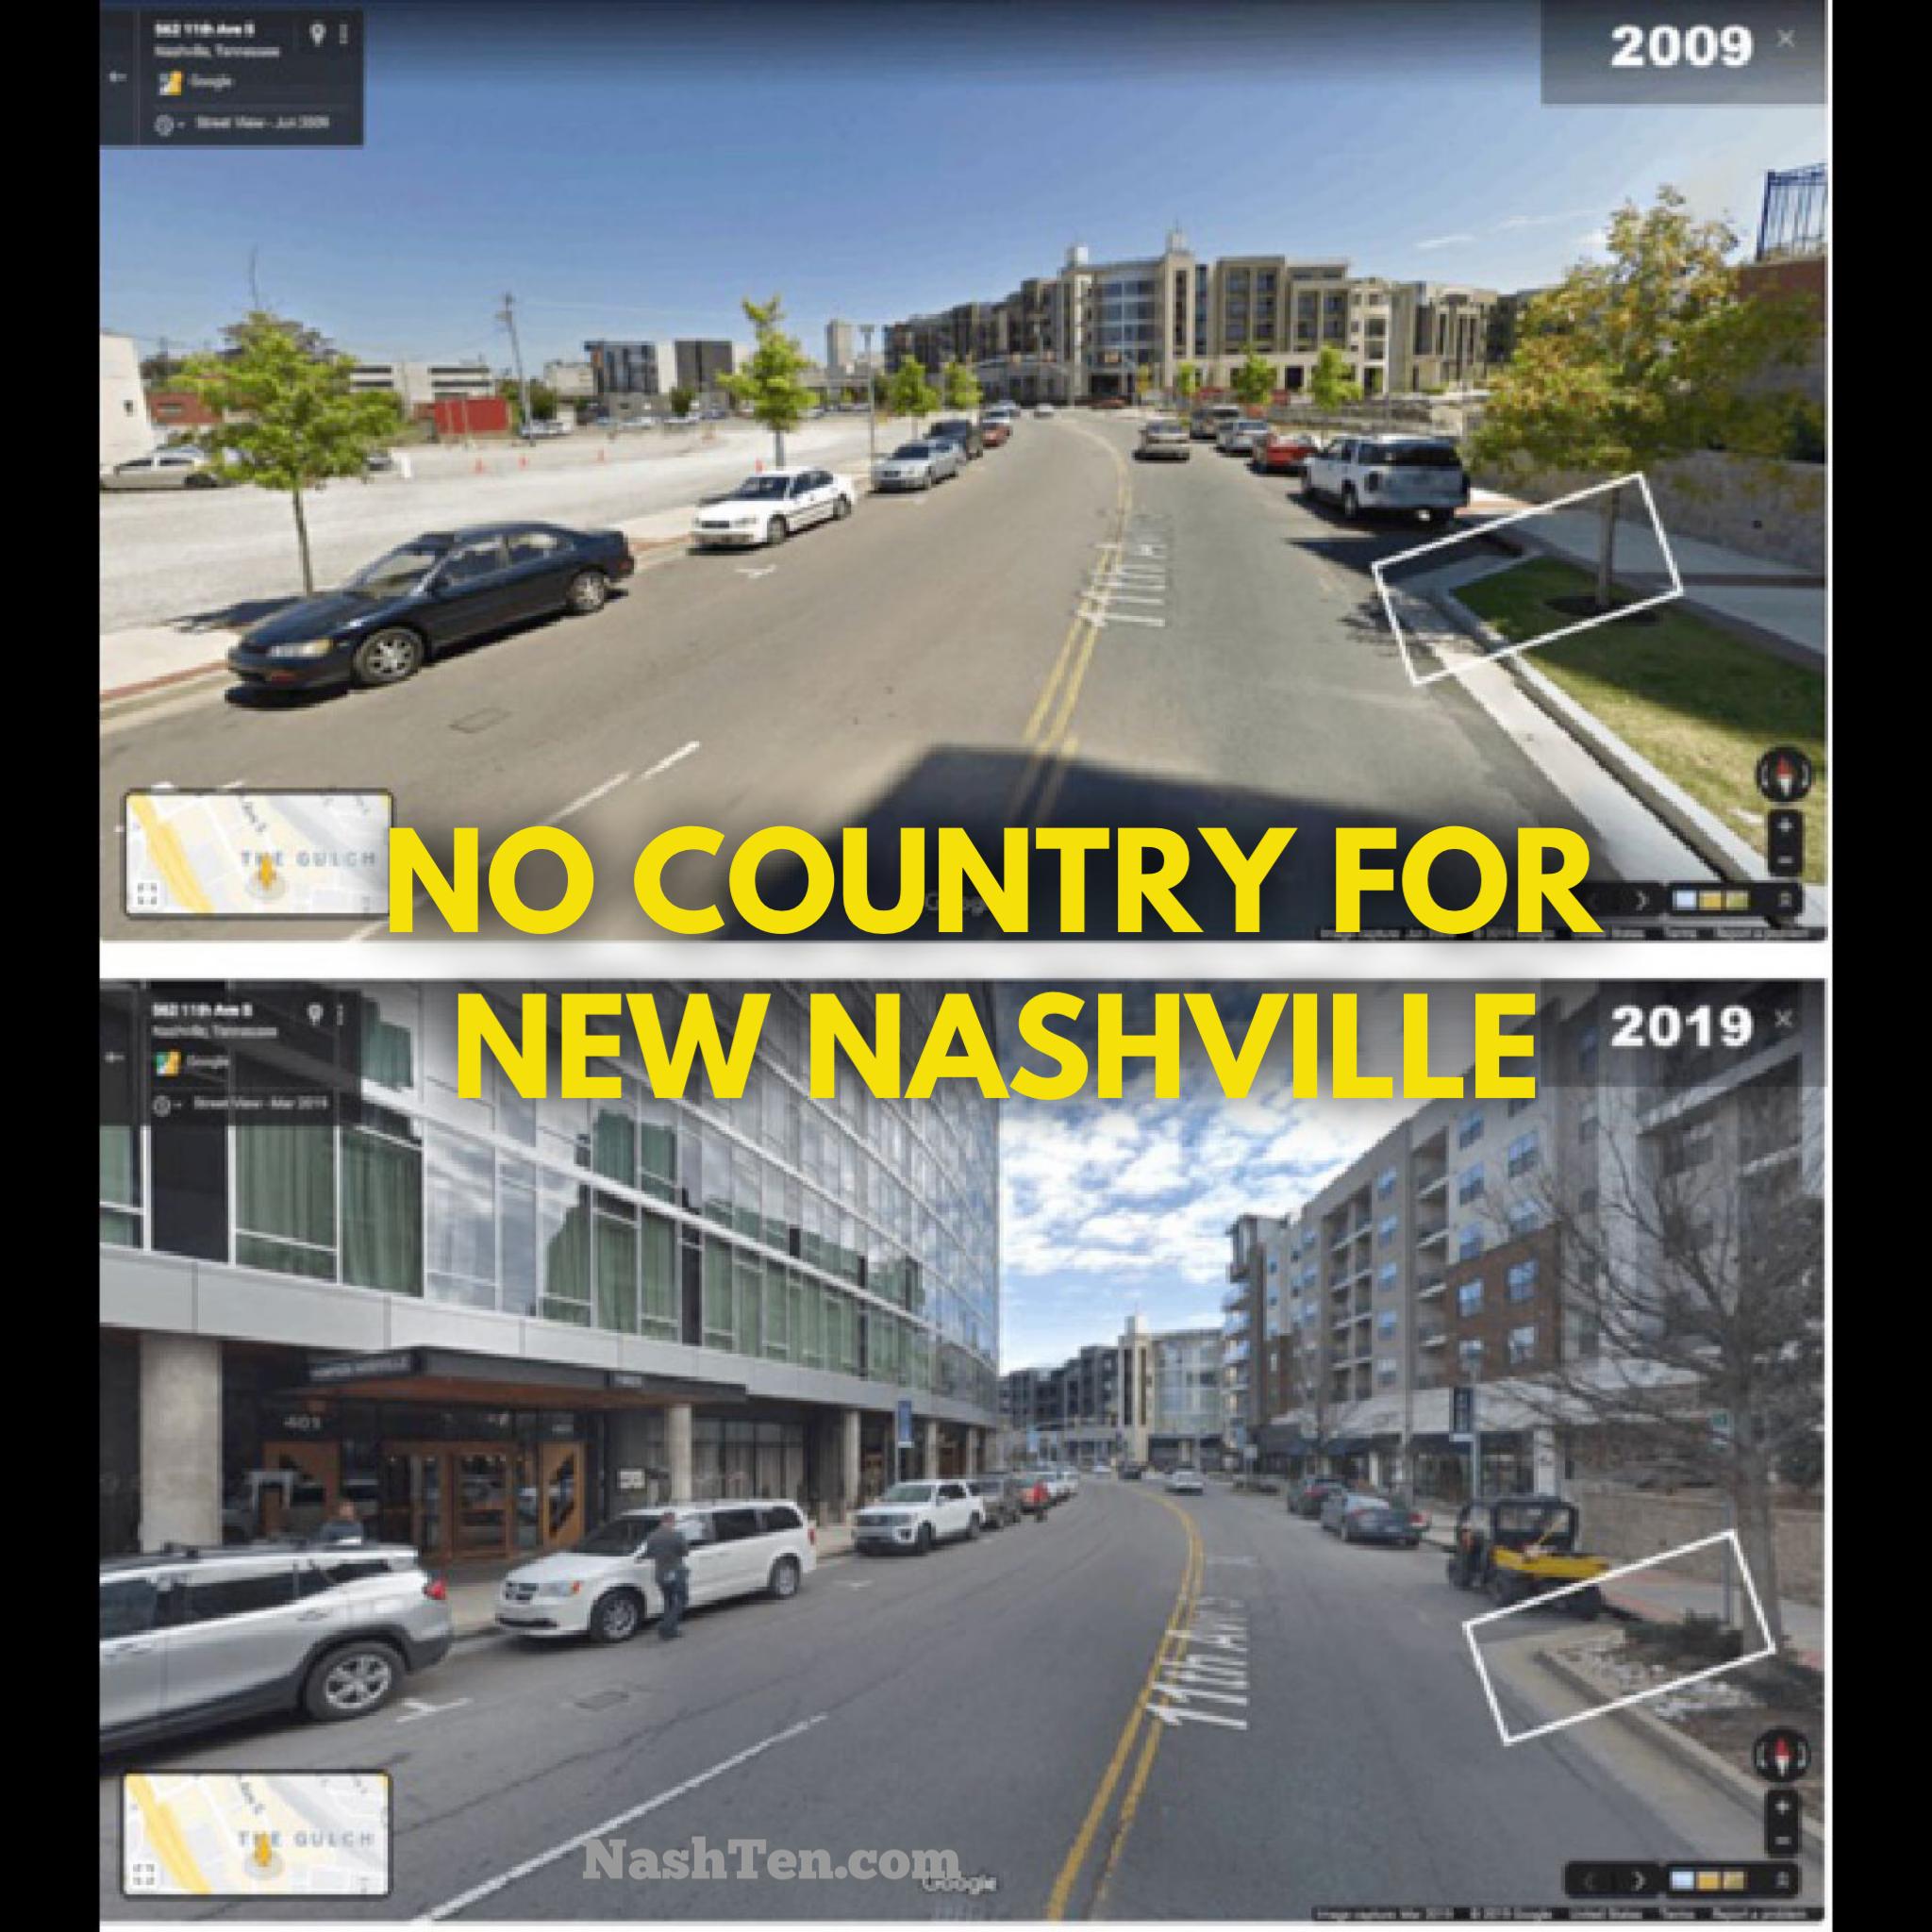 No Country New Nashville